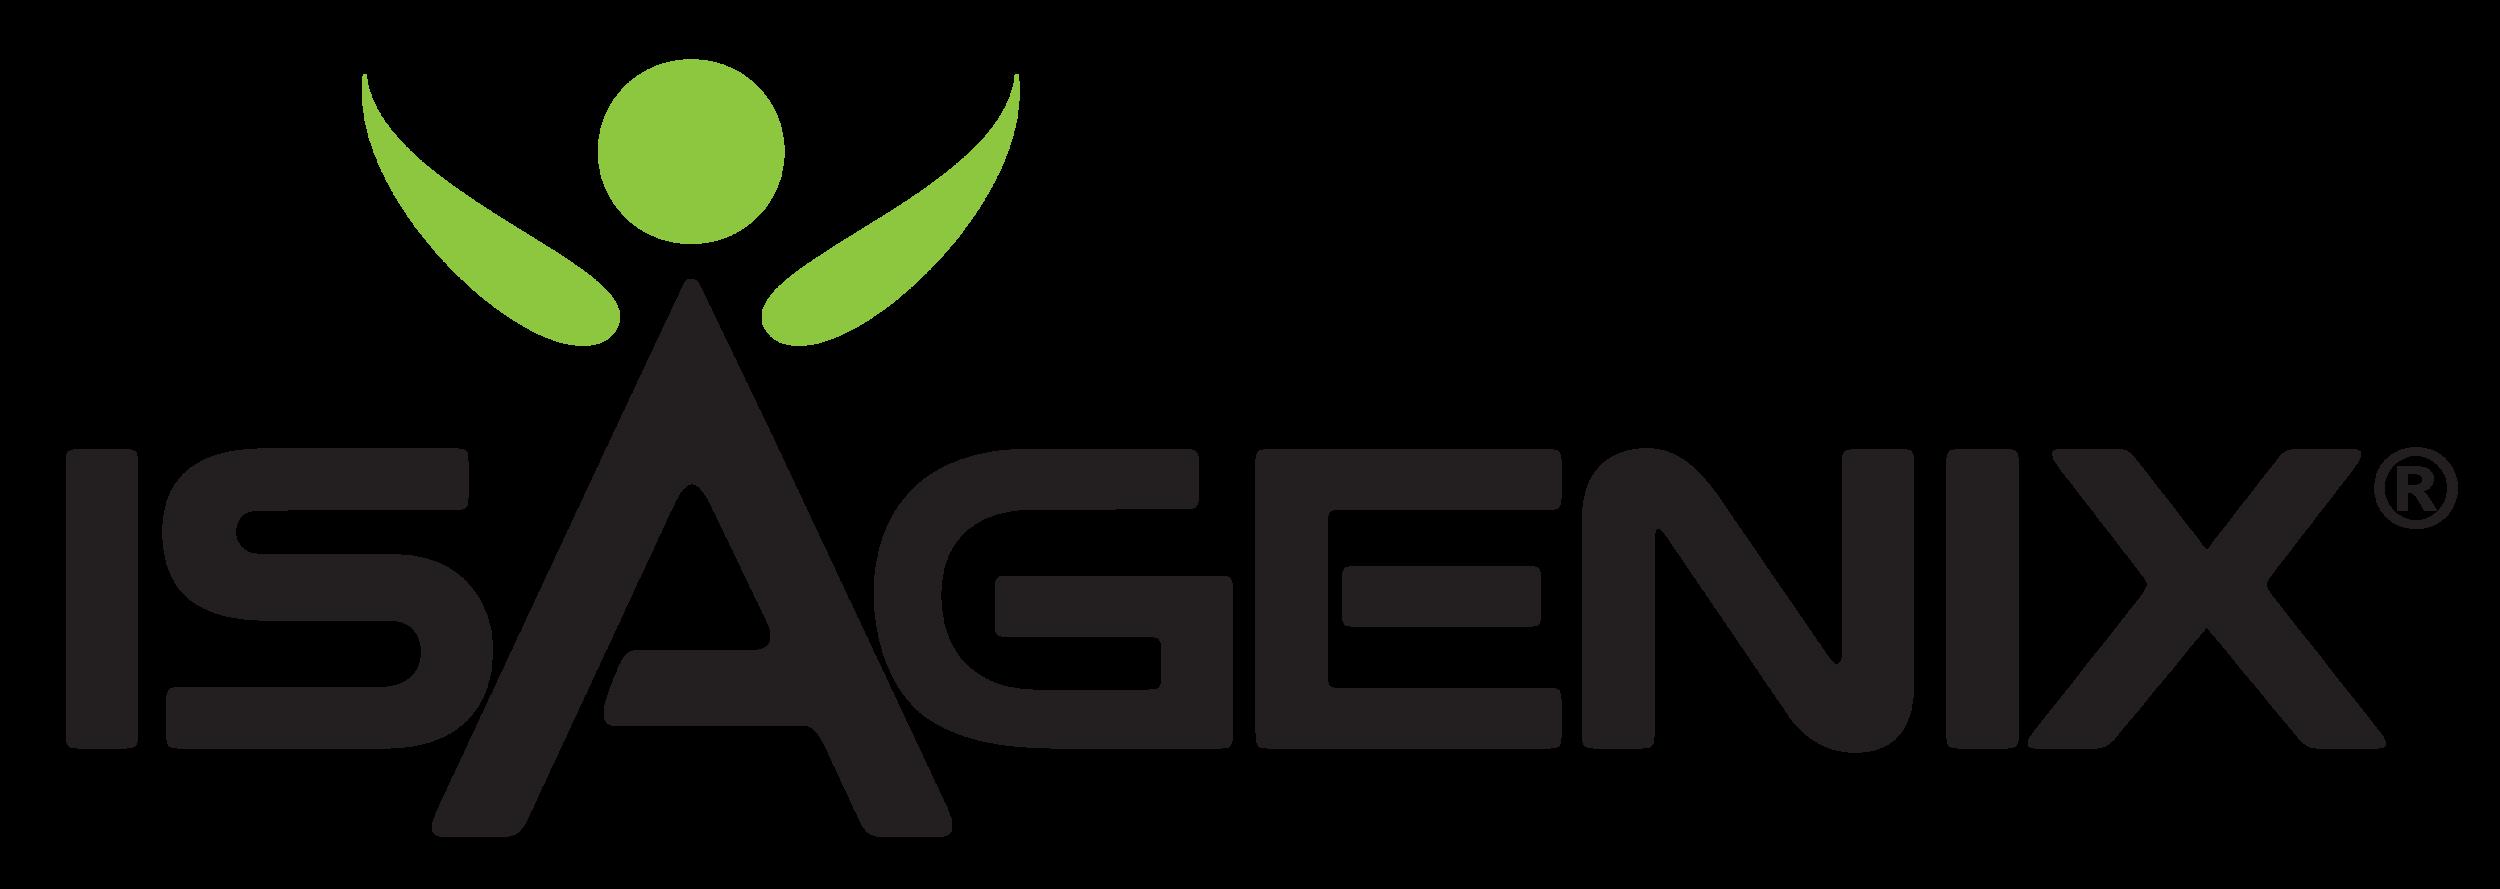 Isagenix_client.png